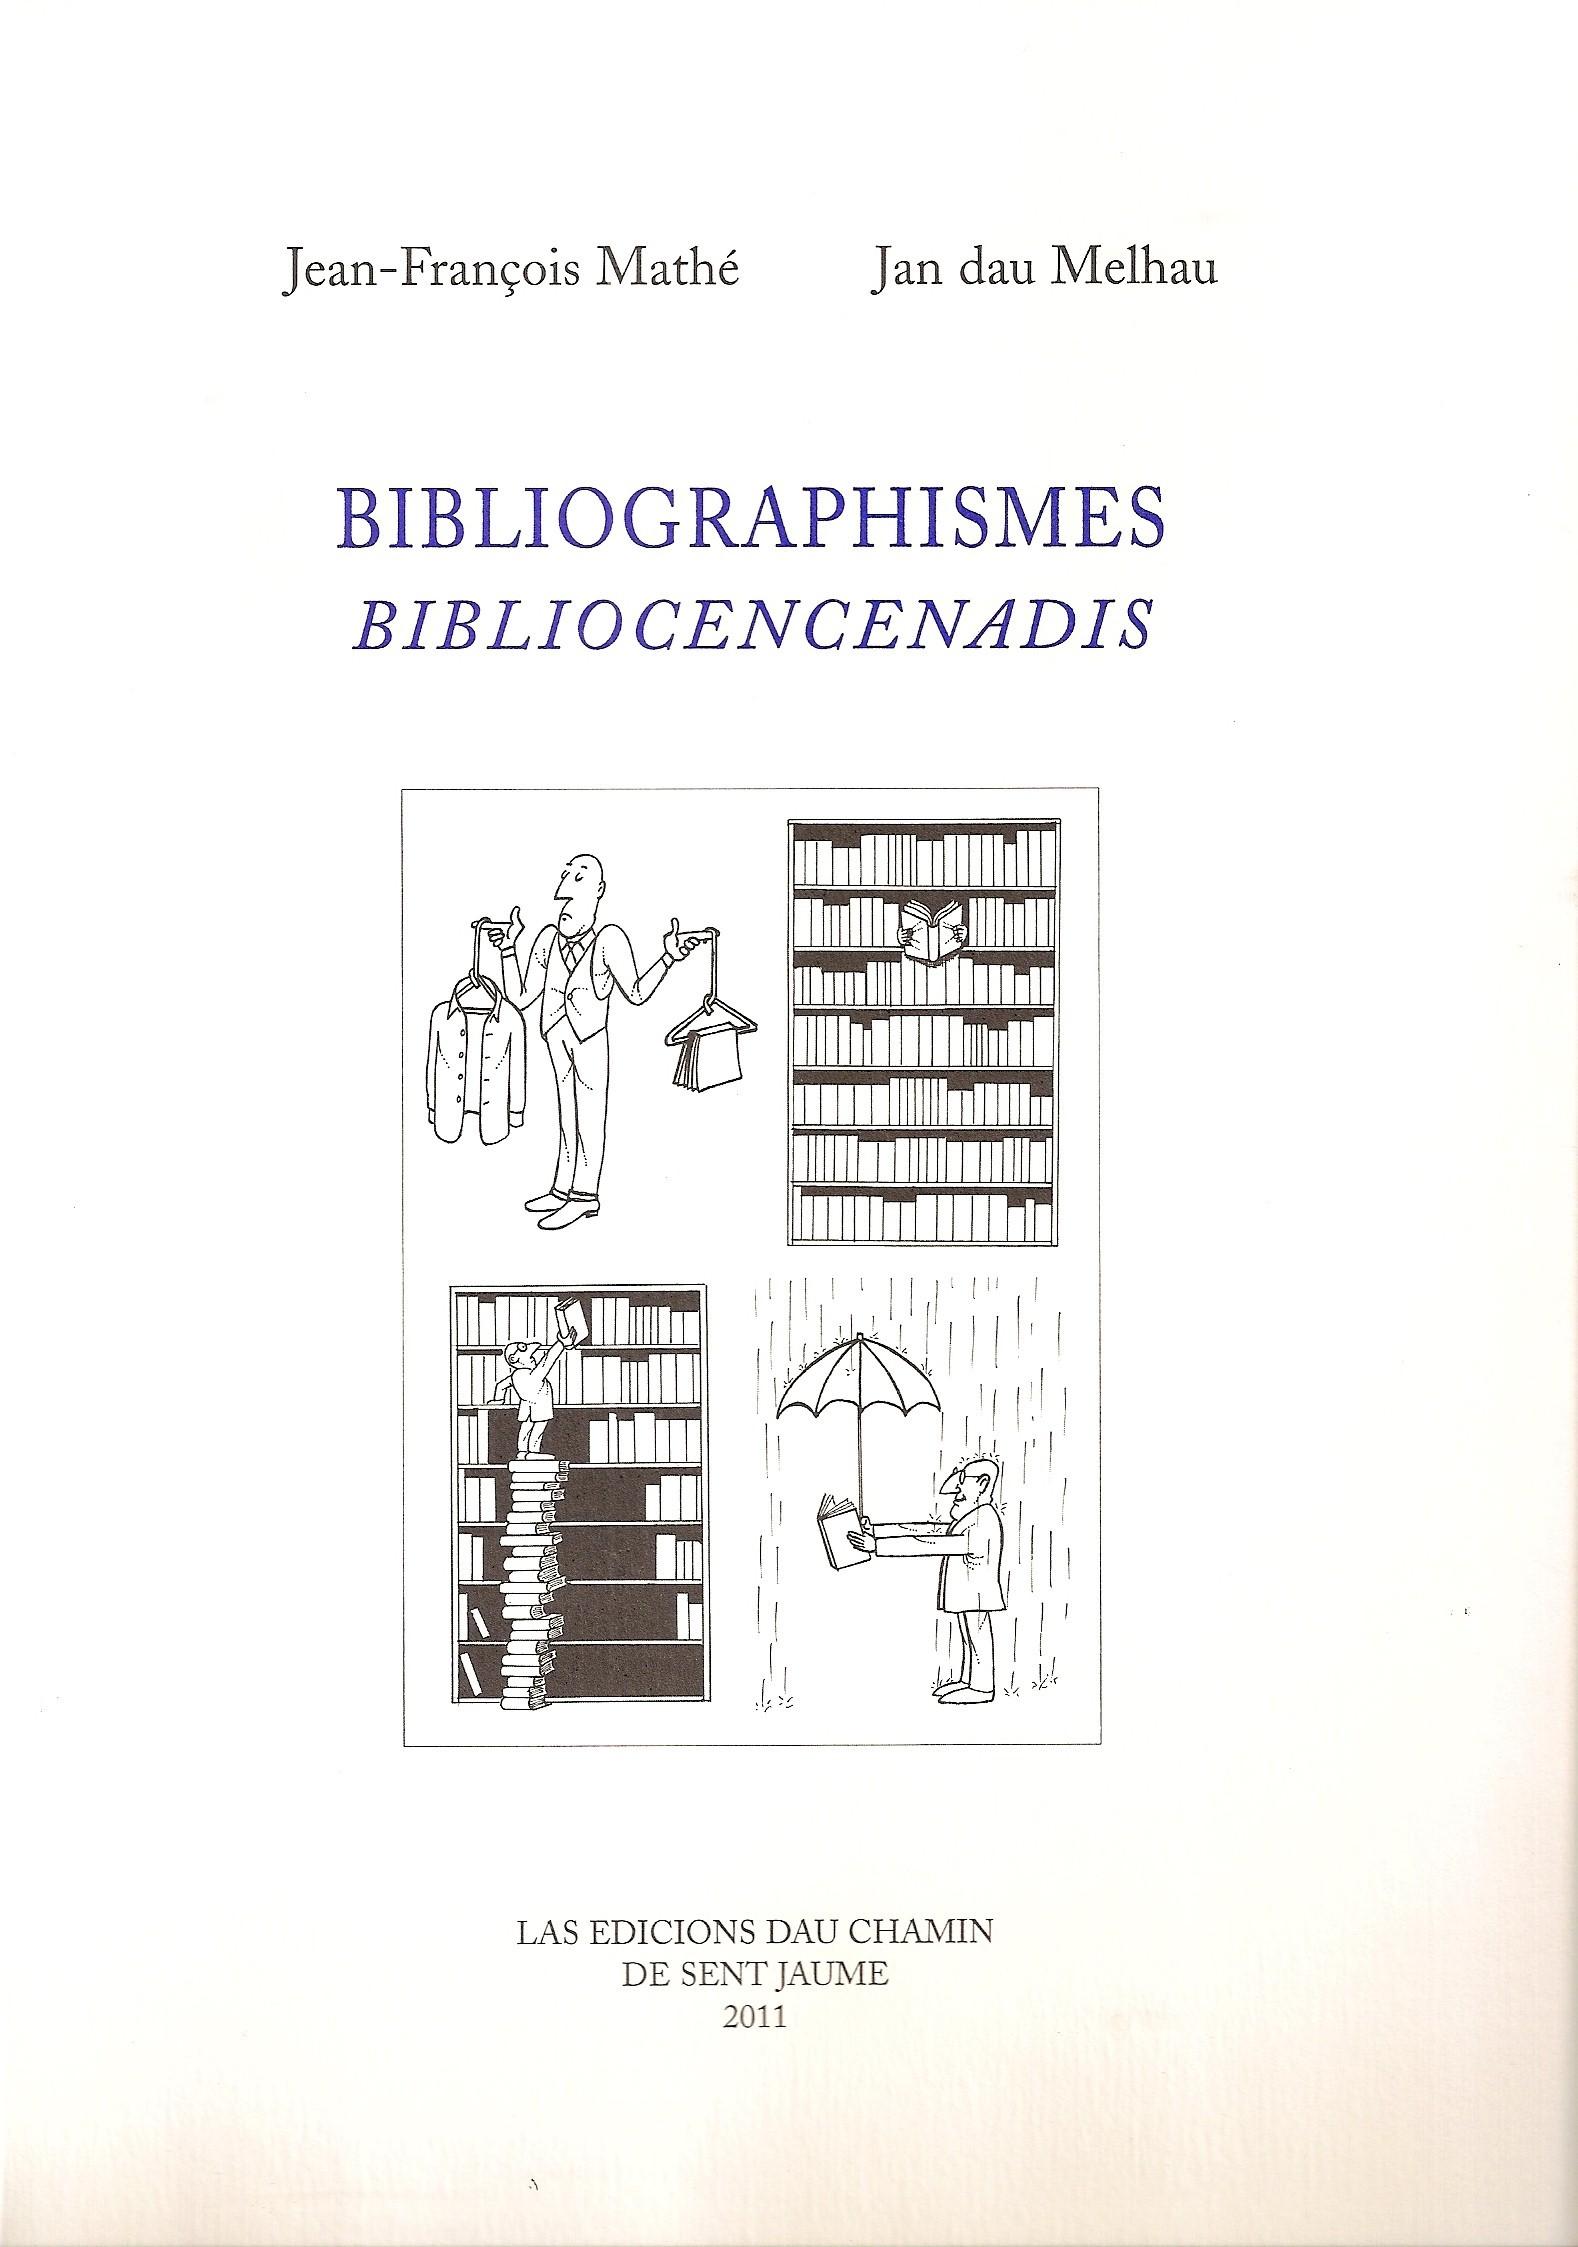 BIBLIOGRAPHISMES / BIBLIOCENCENADIS